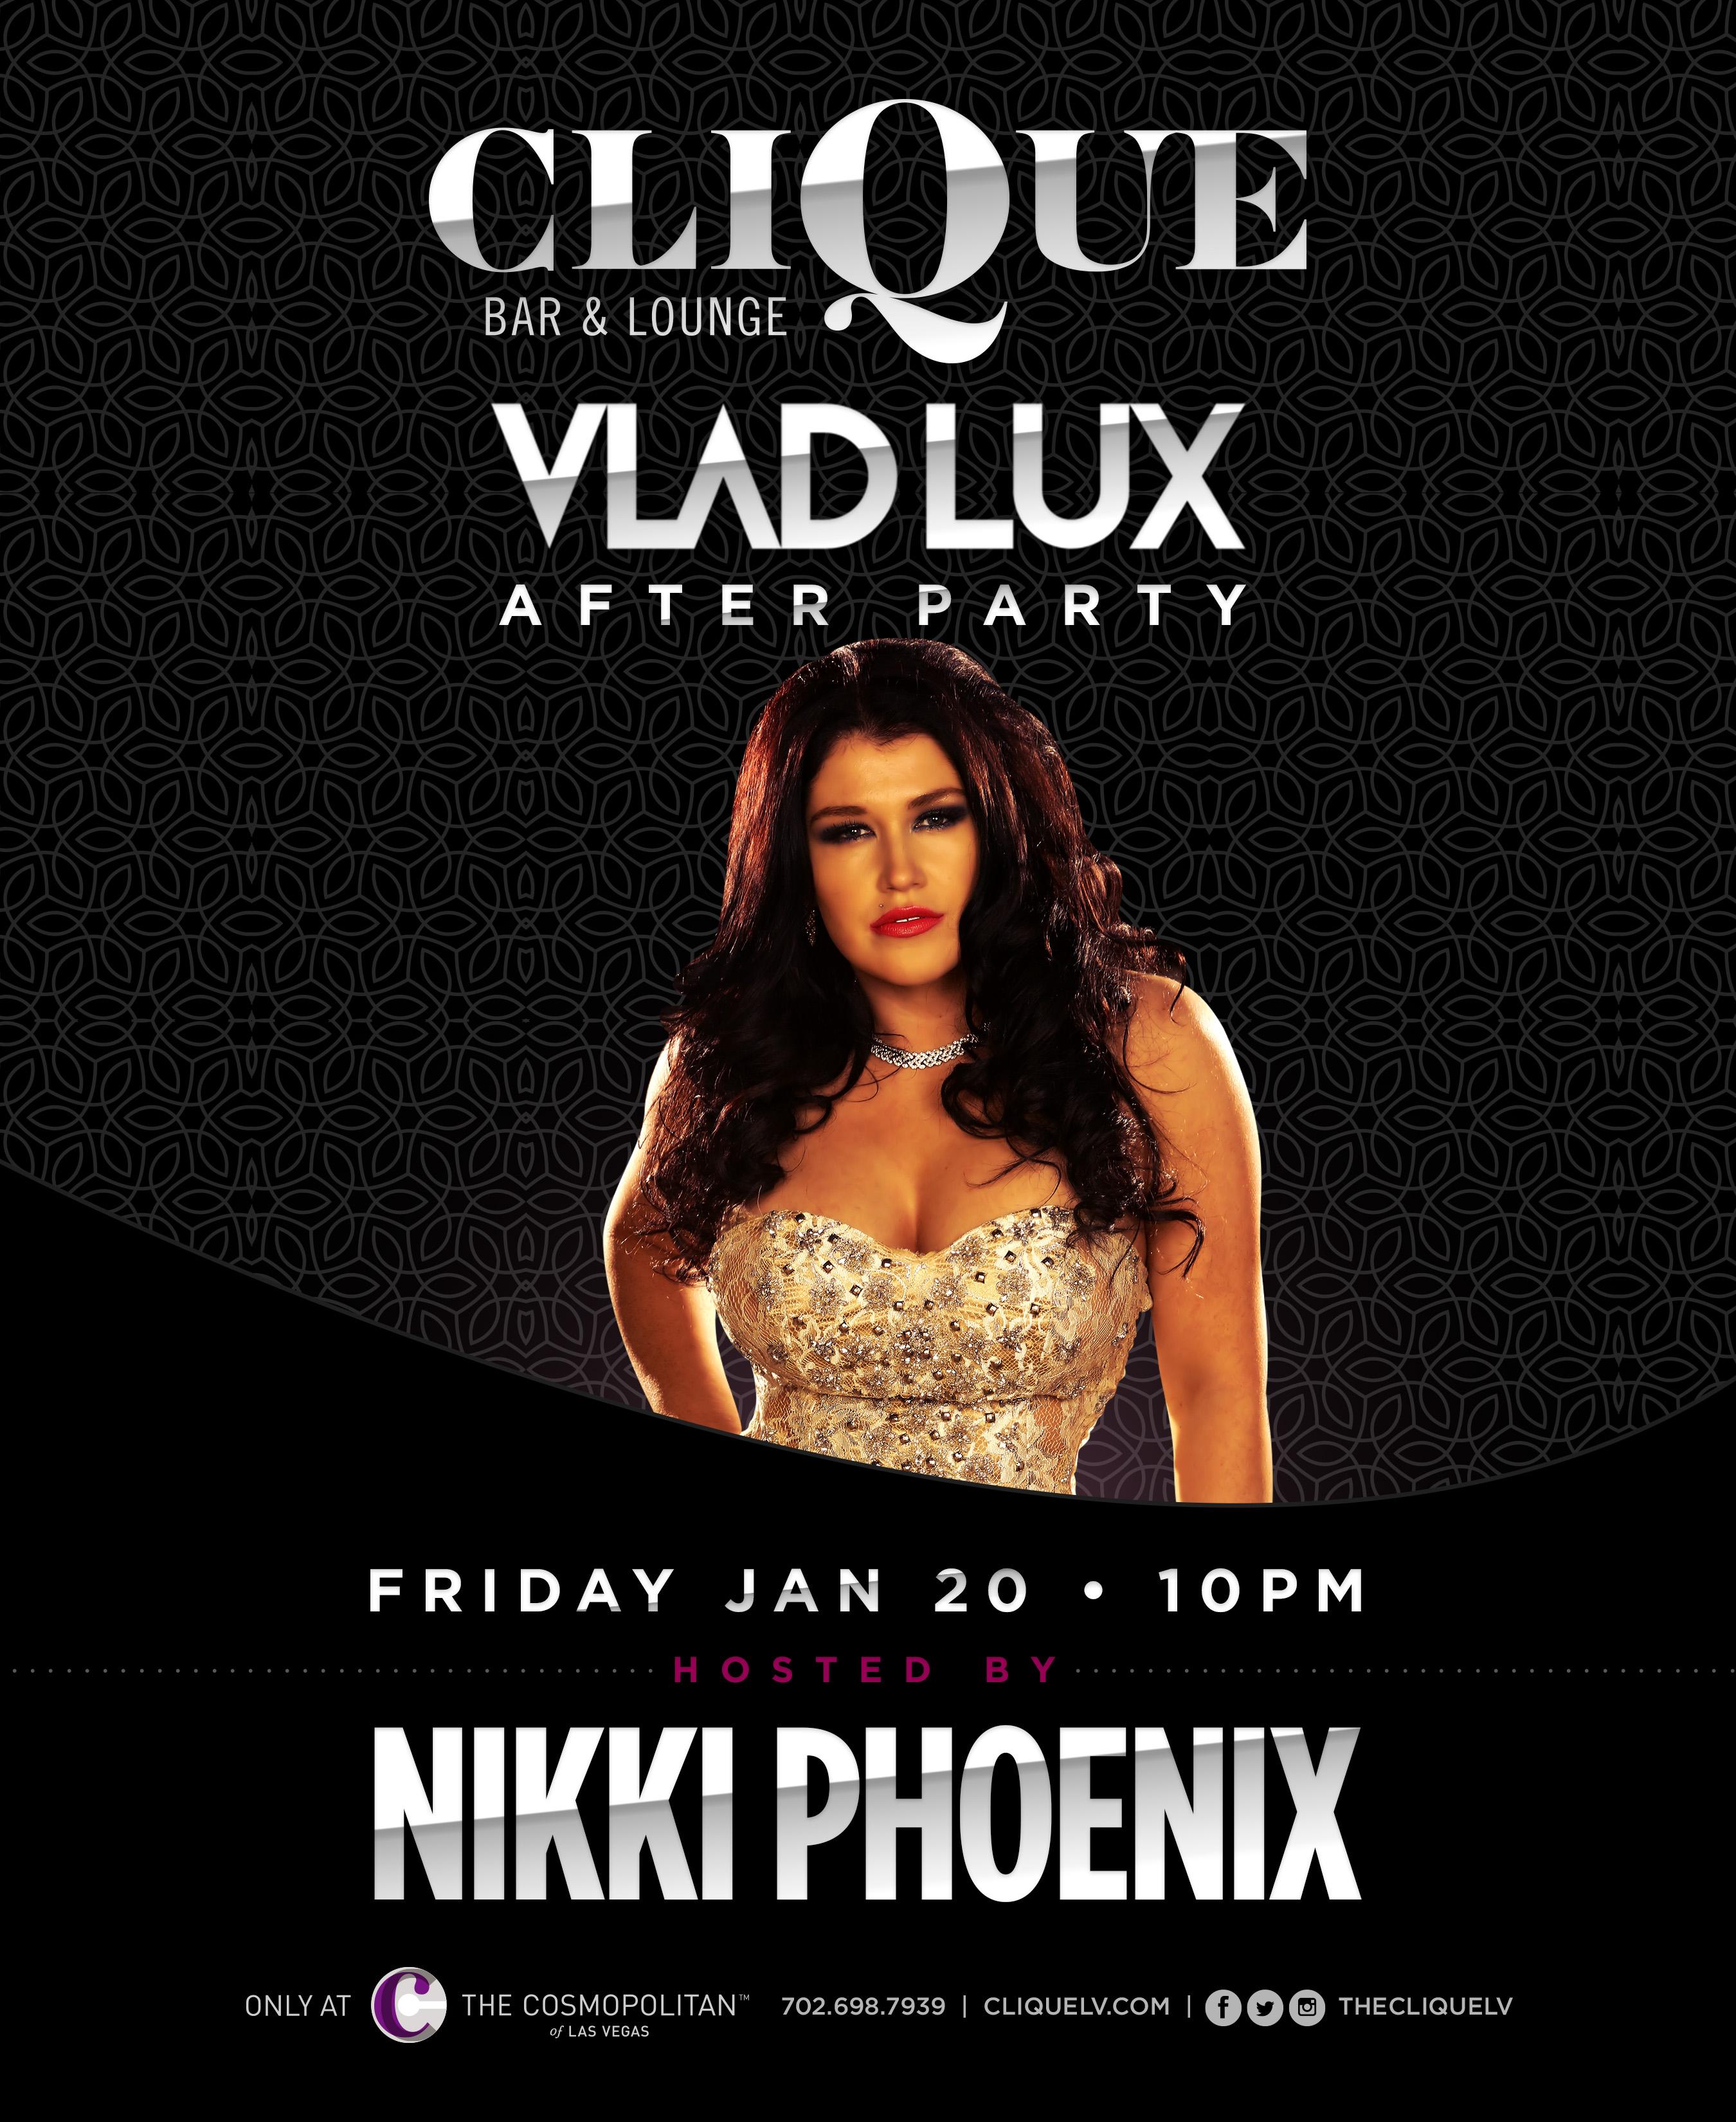 Nikki Phoenix and Vlad Lux at CliQue